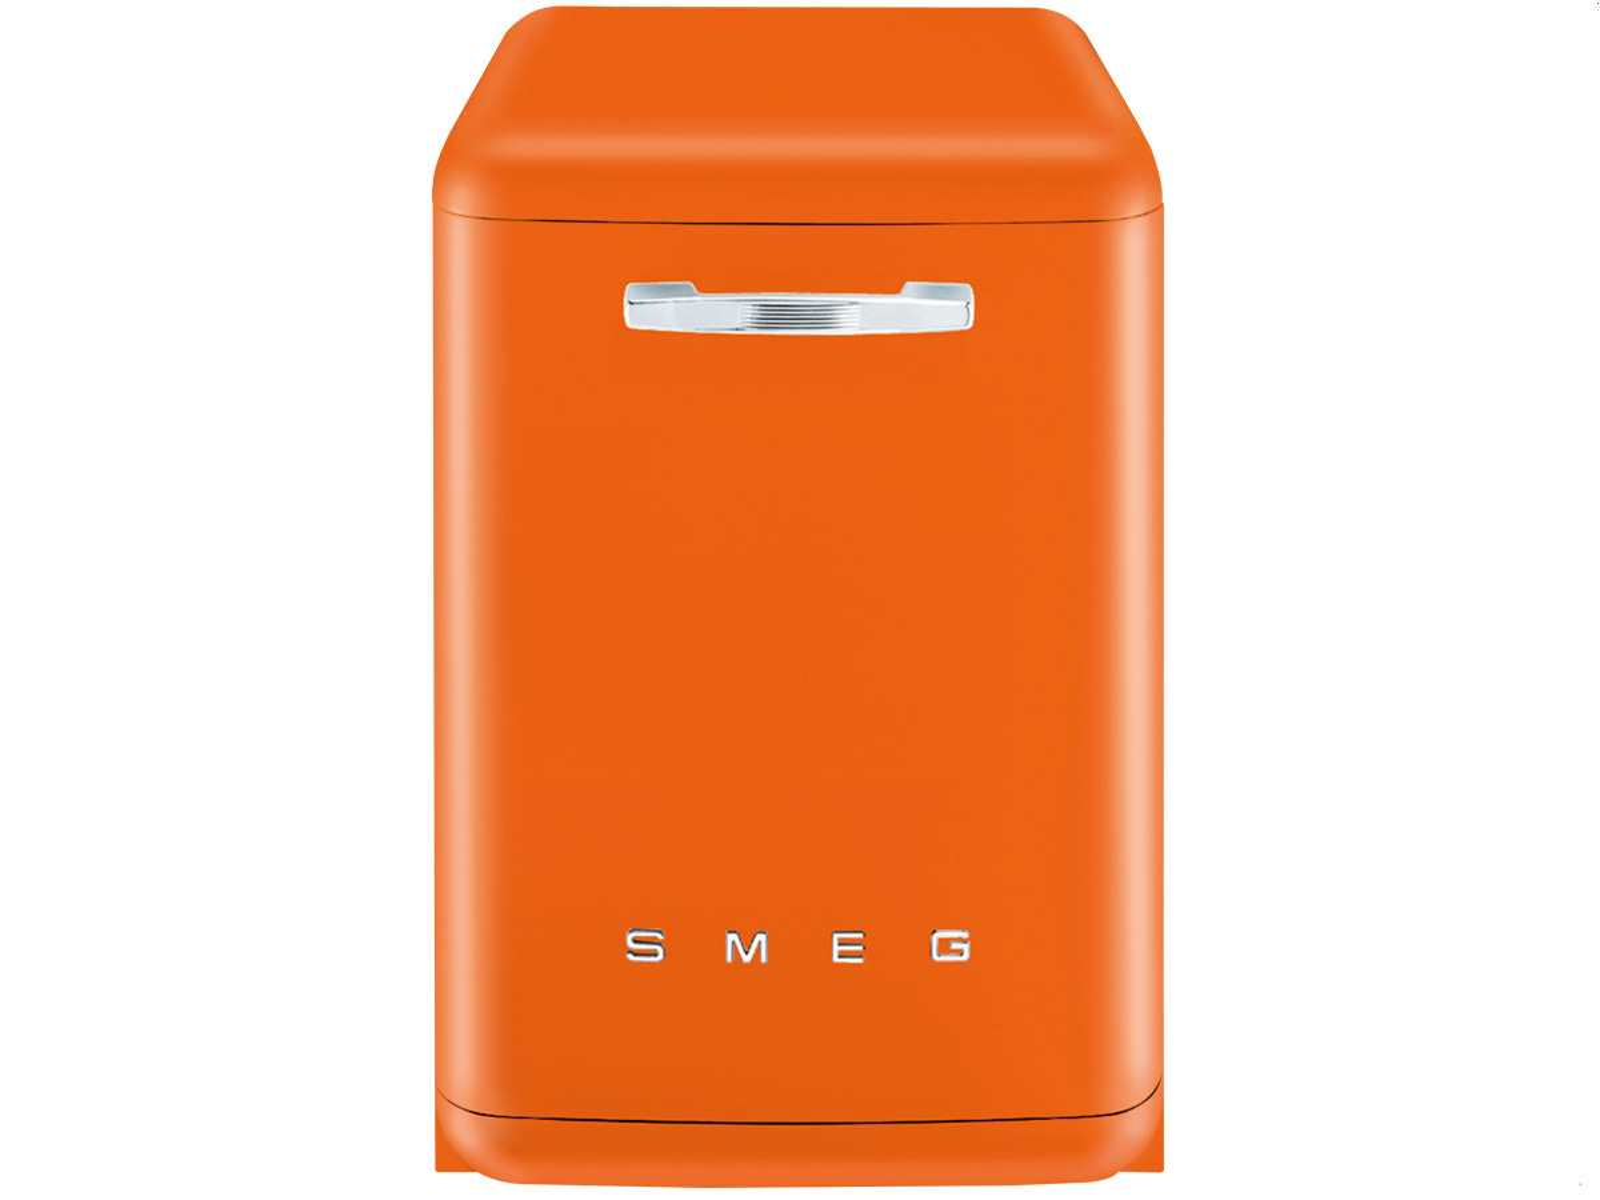 Smeg LVFABOR Standgeschirrspüler Orange